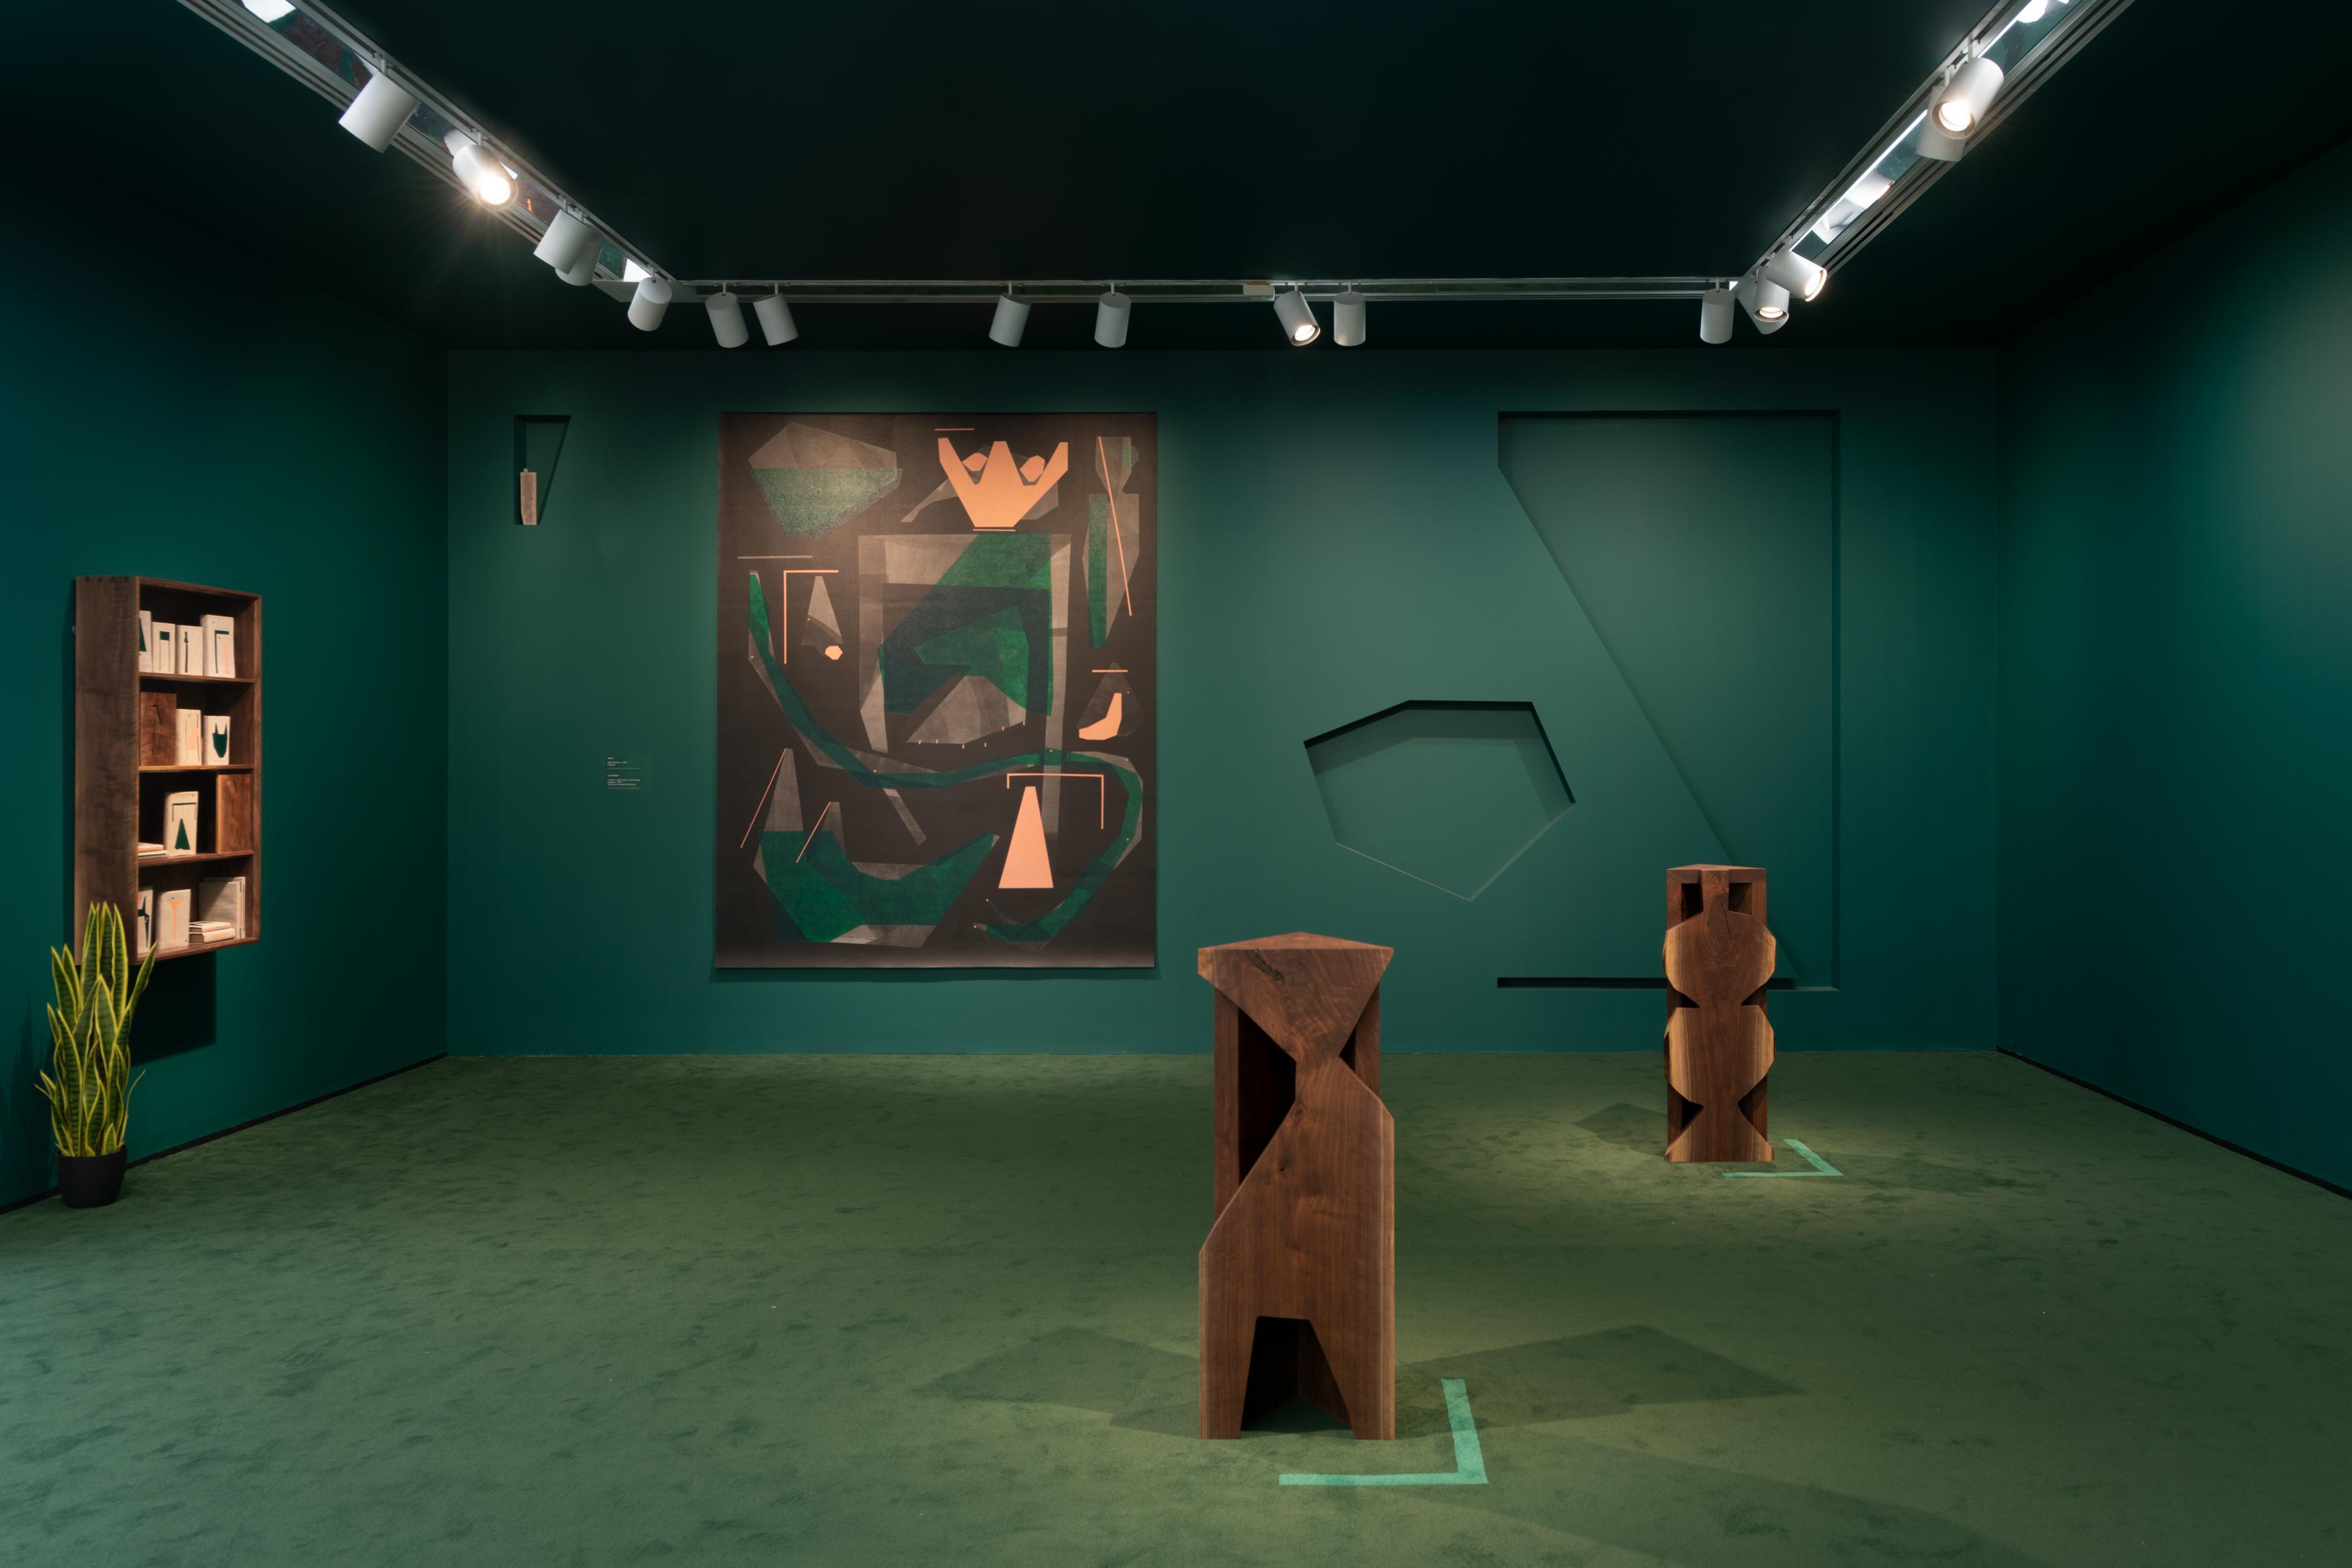 Caroline Kent exhibition